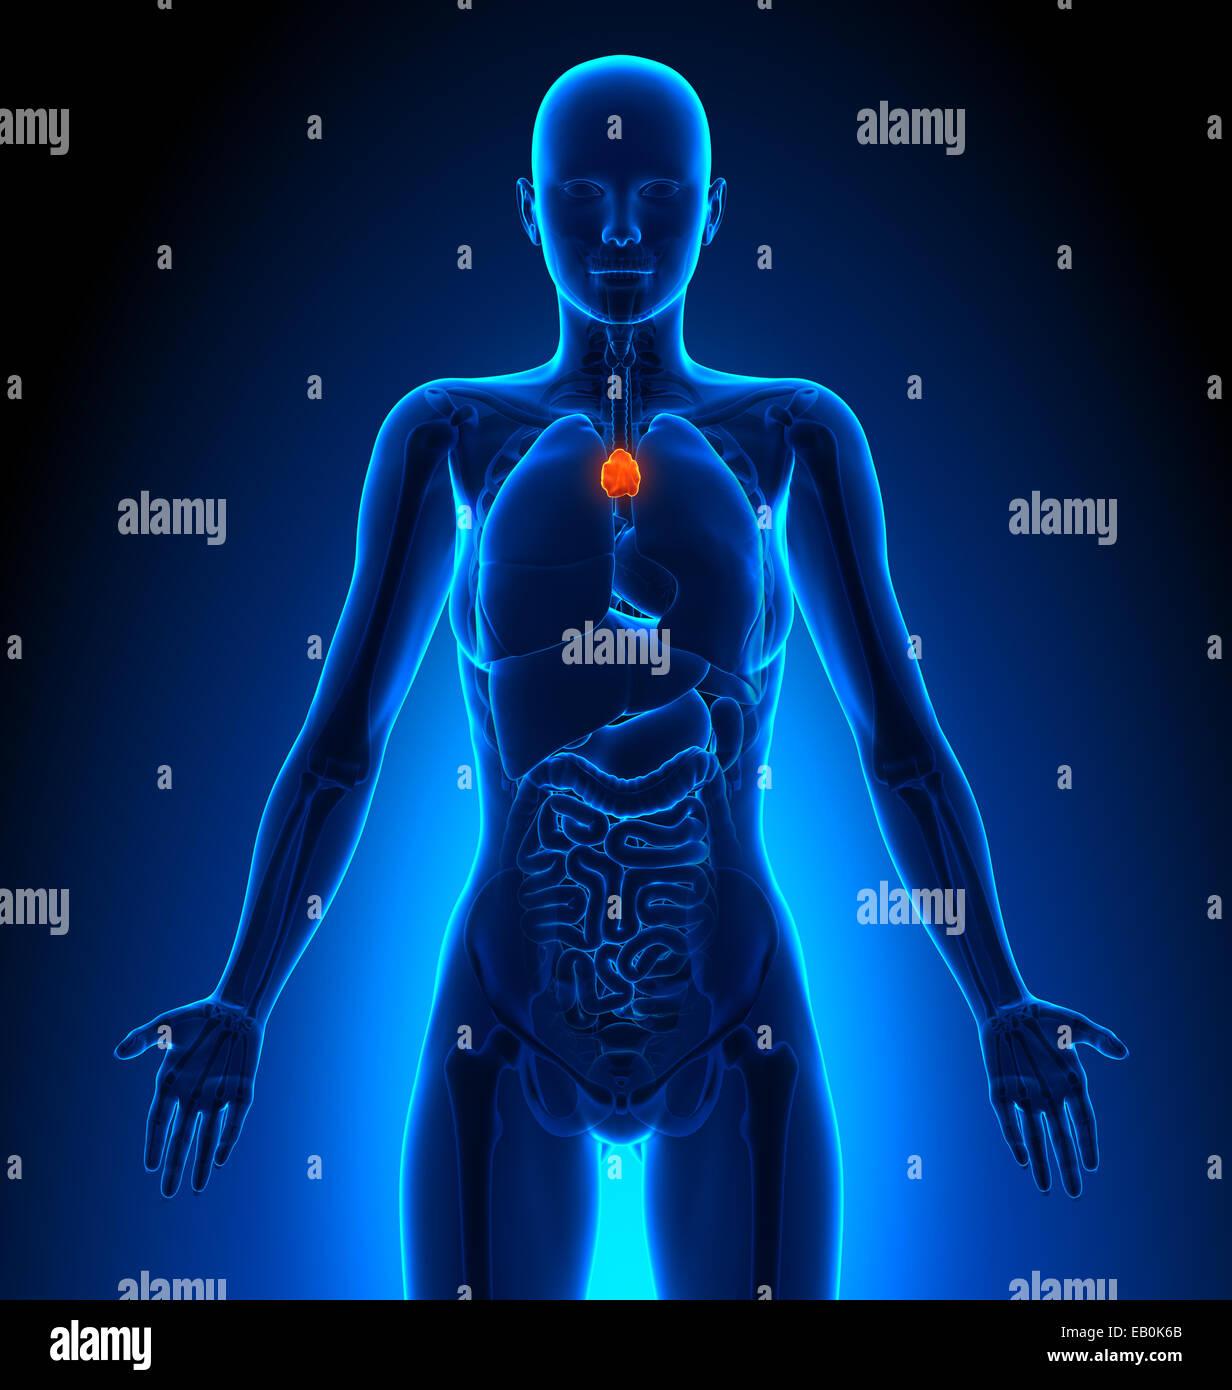 Thymus - Female Organs - Human Anatomy Stock Photo: 75617763 - Alamy